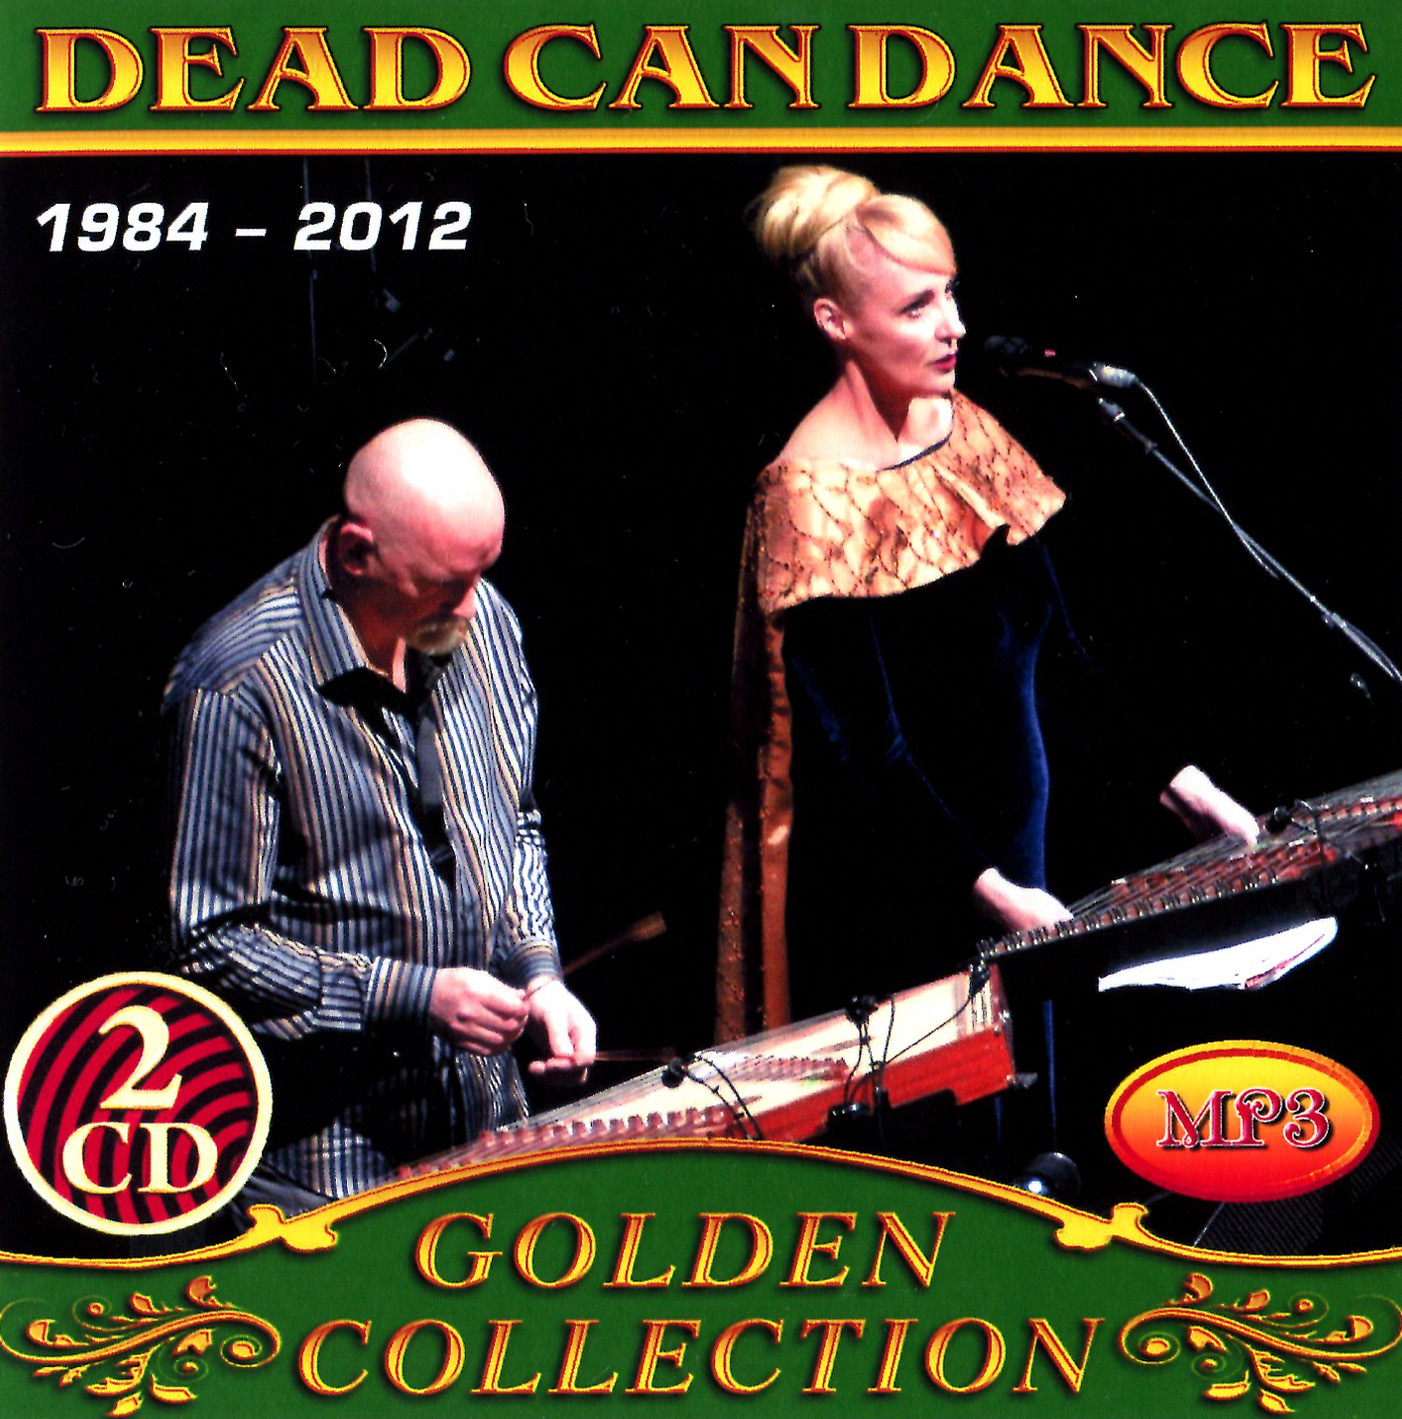 Dead Can Dance 2cd [mp3]